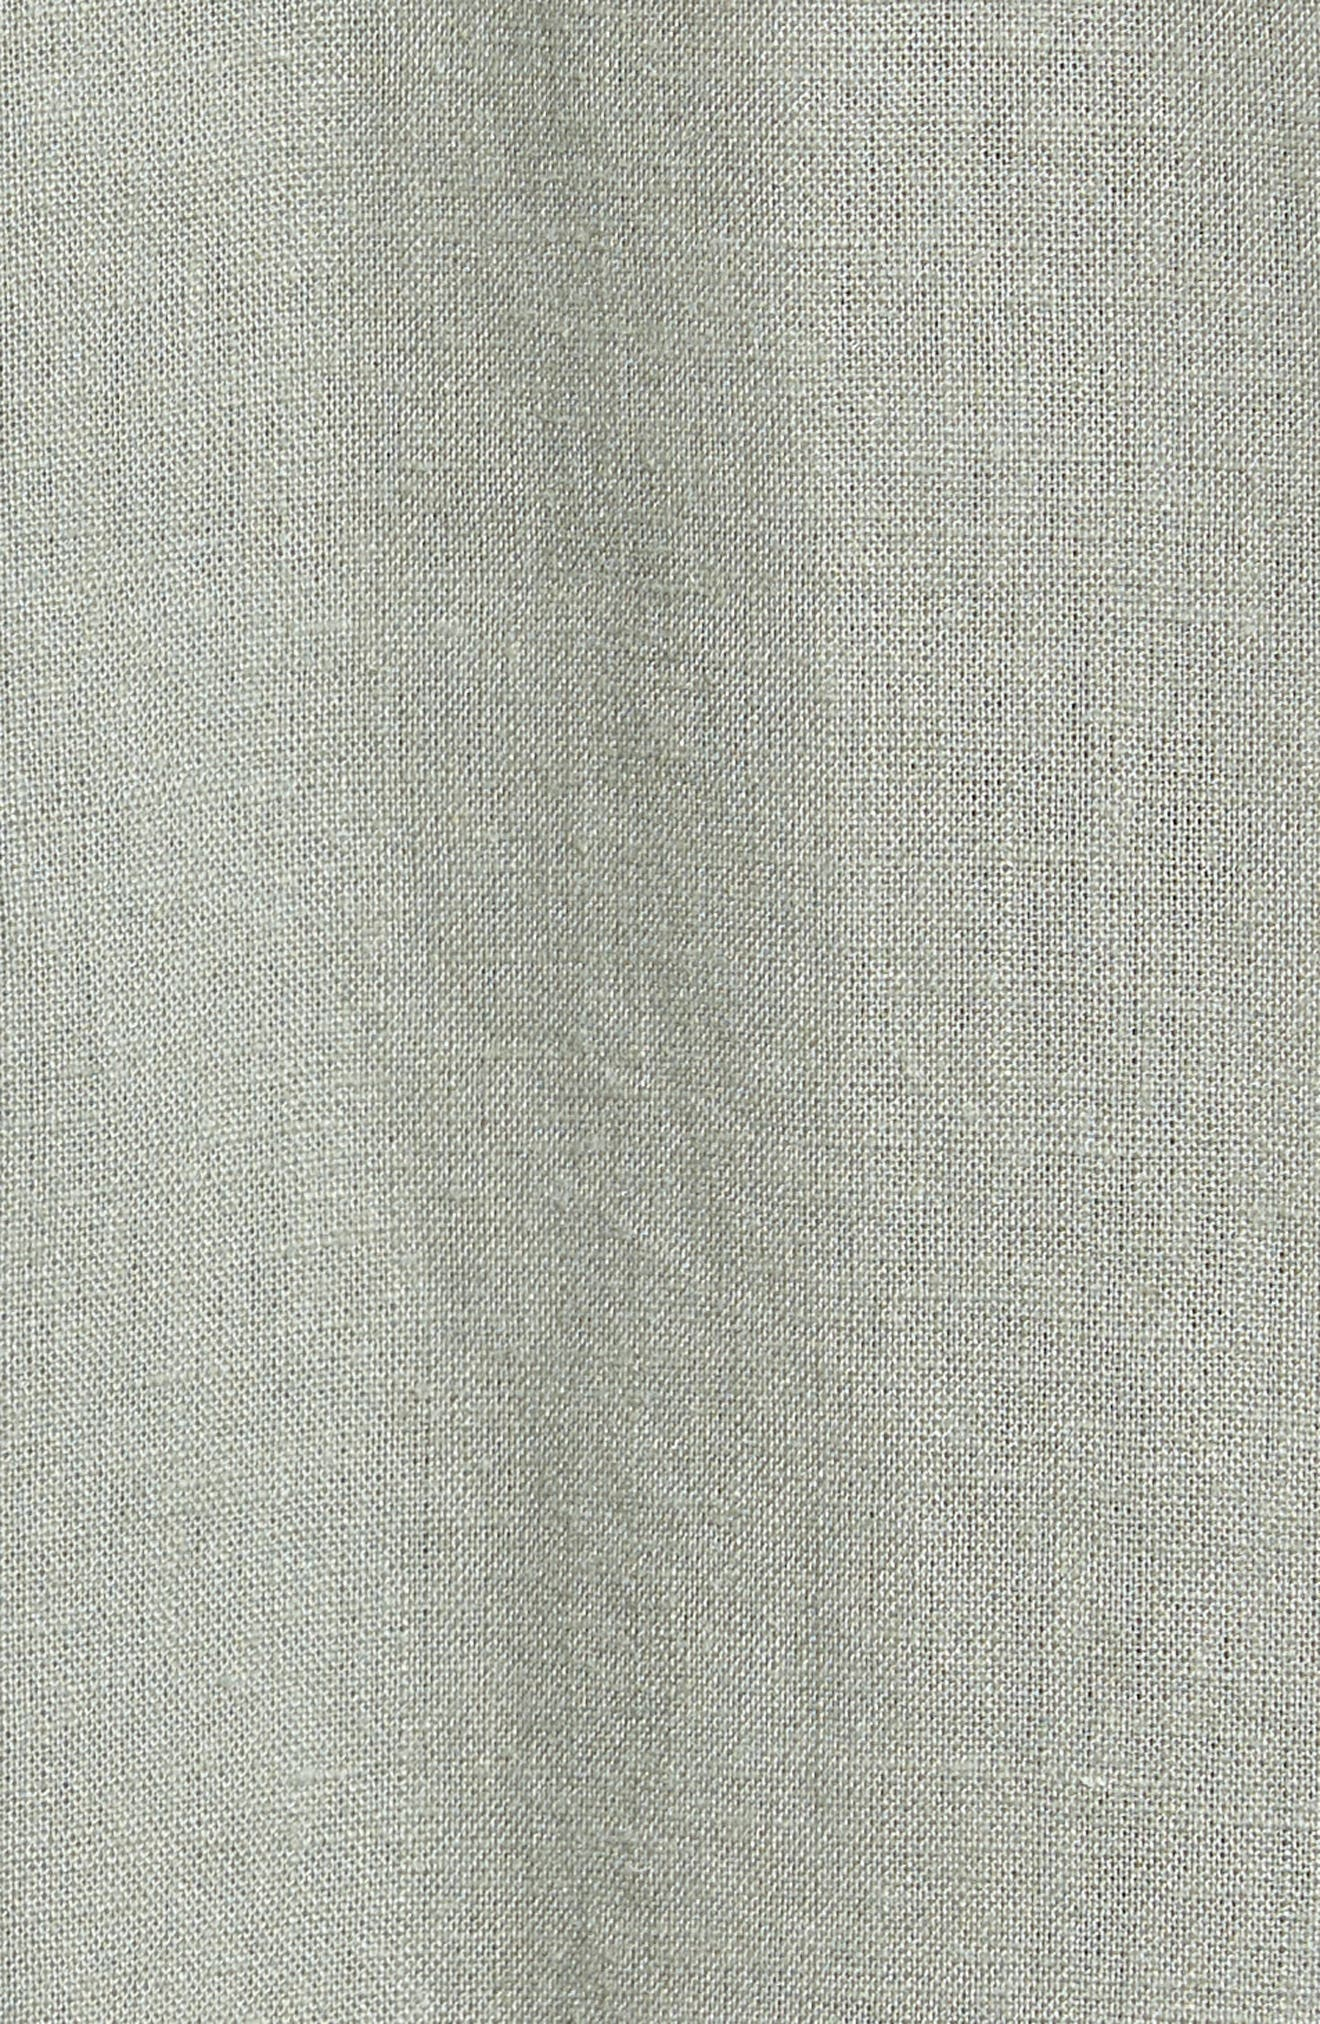 Kona Embroidered Shirt,                             Alternate thumbnail 5, color,                             320